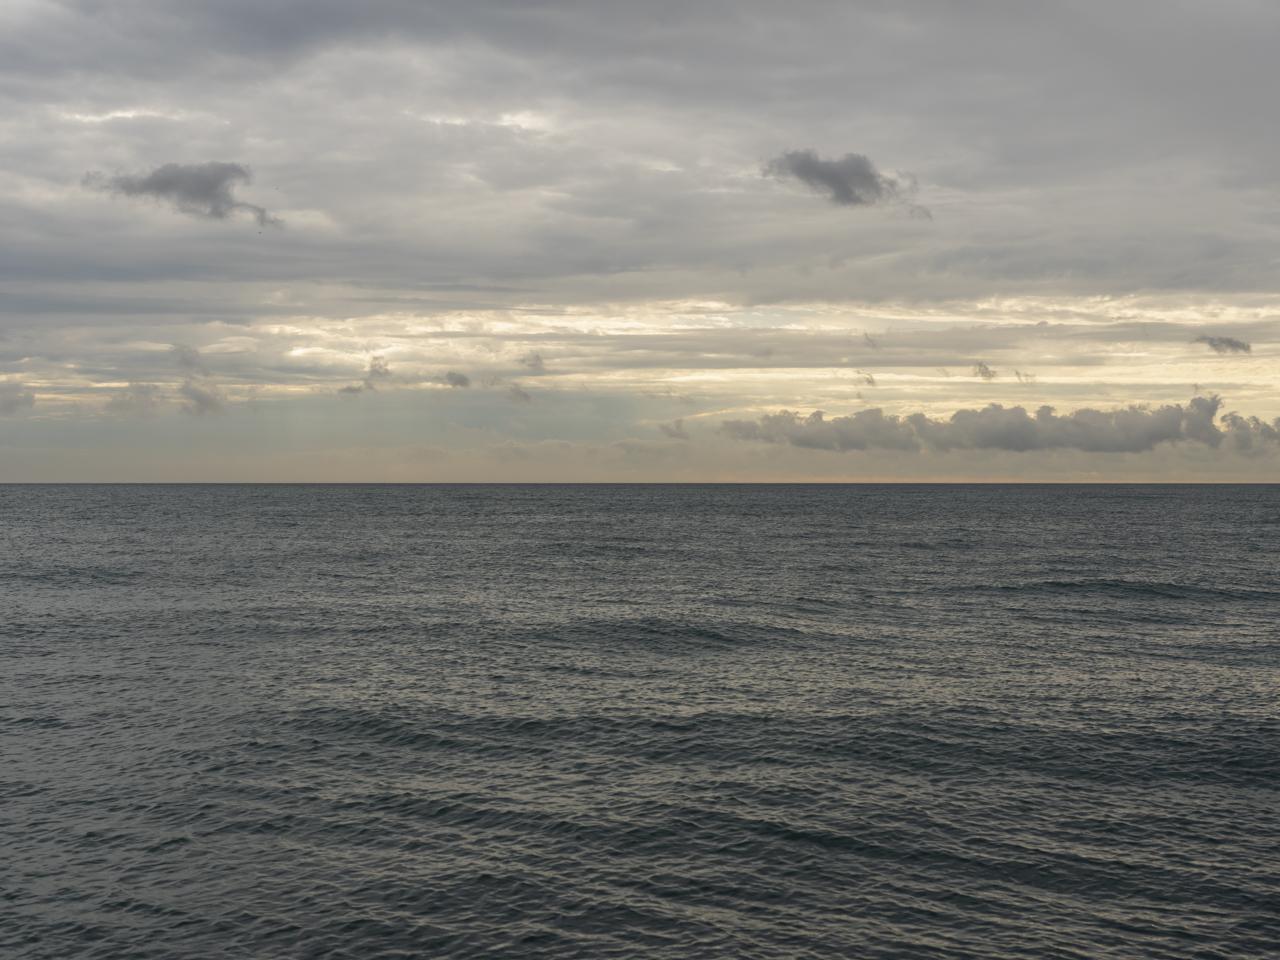 sunlight peeking through heavy clouds over Lake Michigan